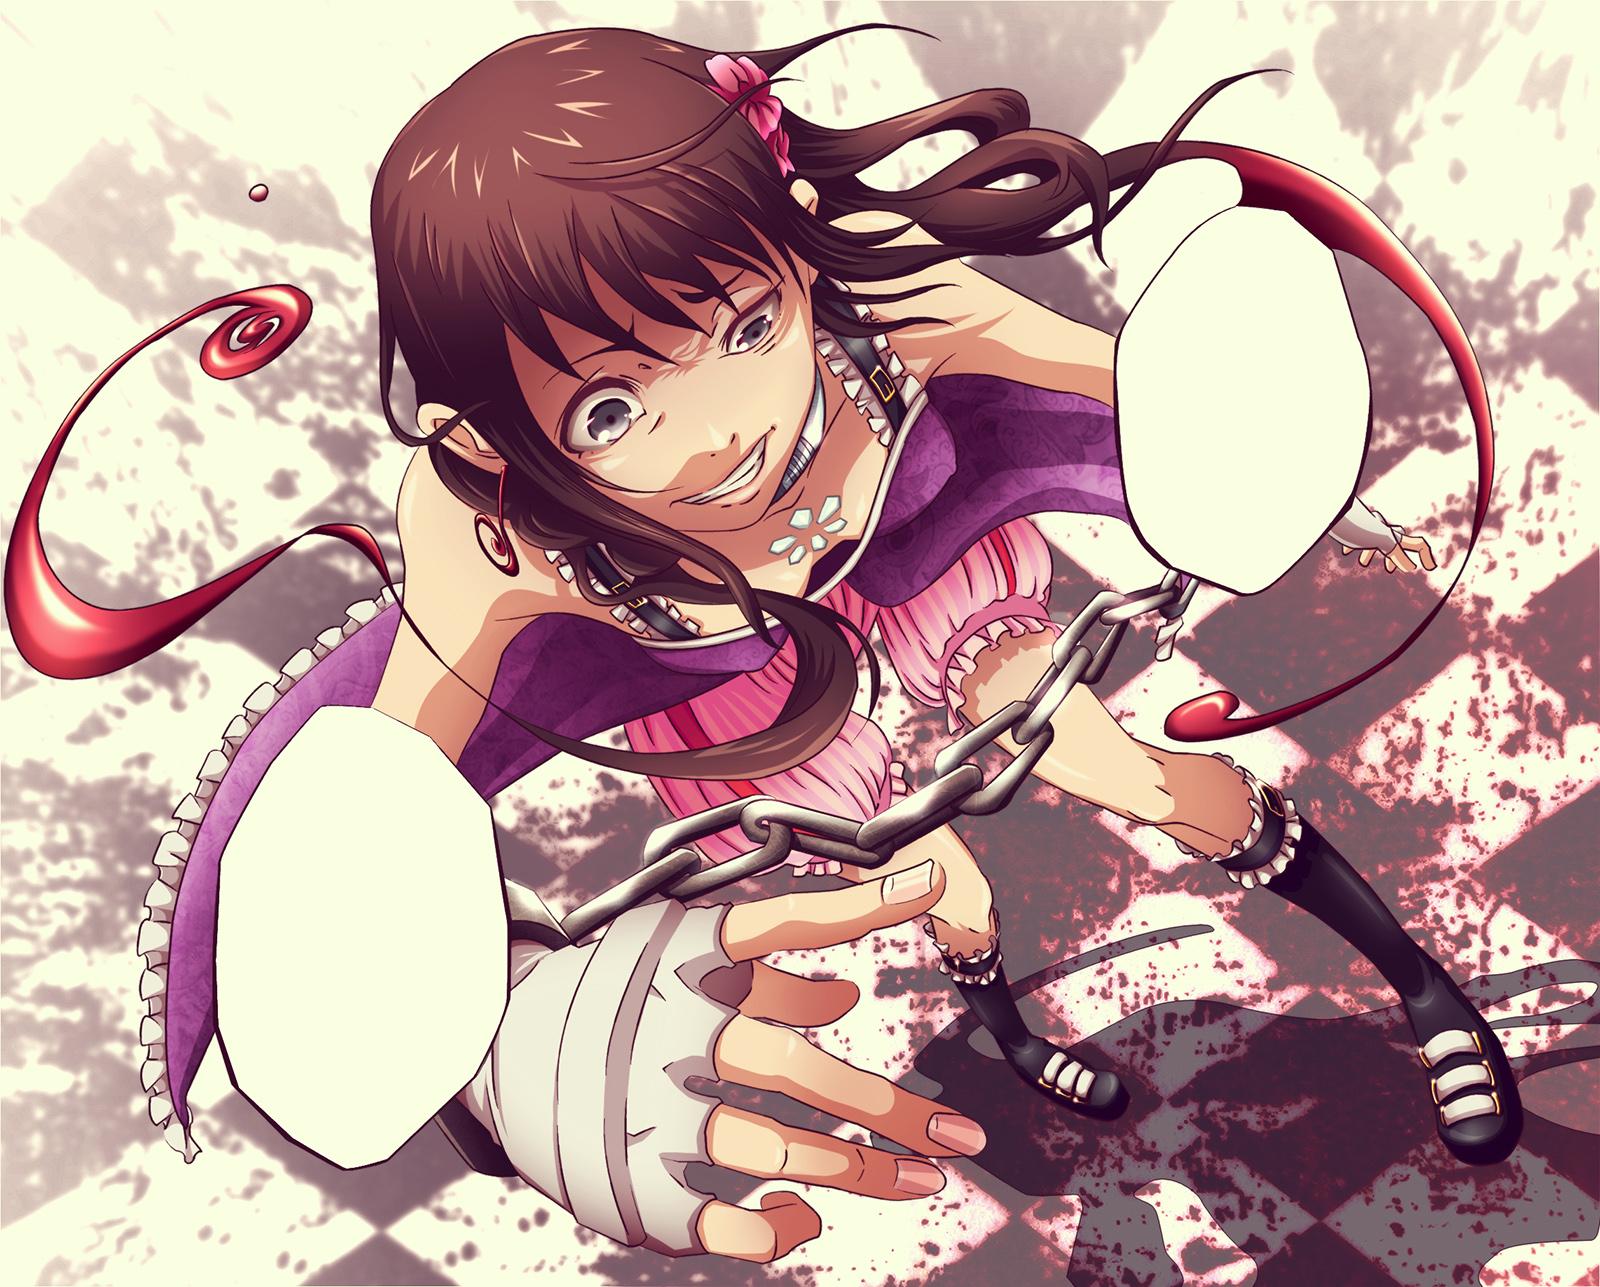 Gurren Lagann Quotes Wallpaper Deadman Wonderland 5 Wallpapers Your Daily Anime